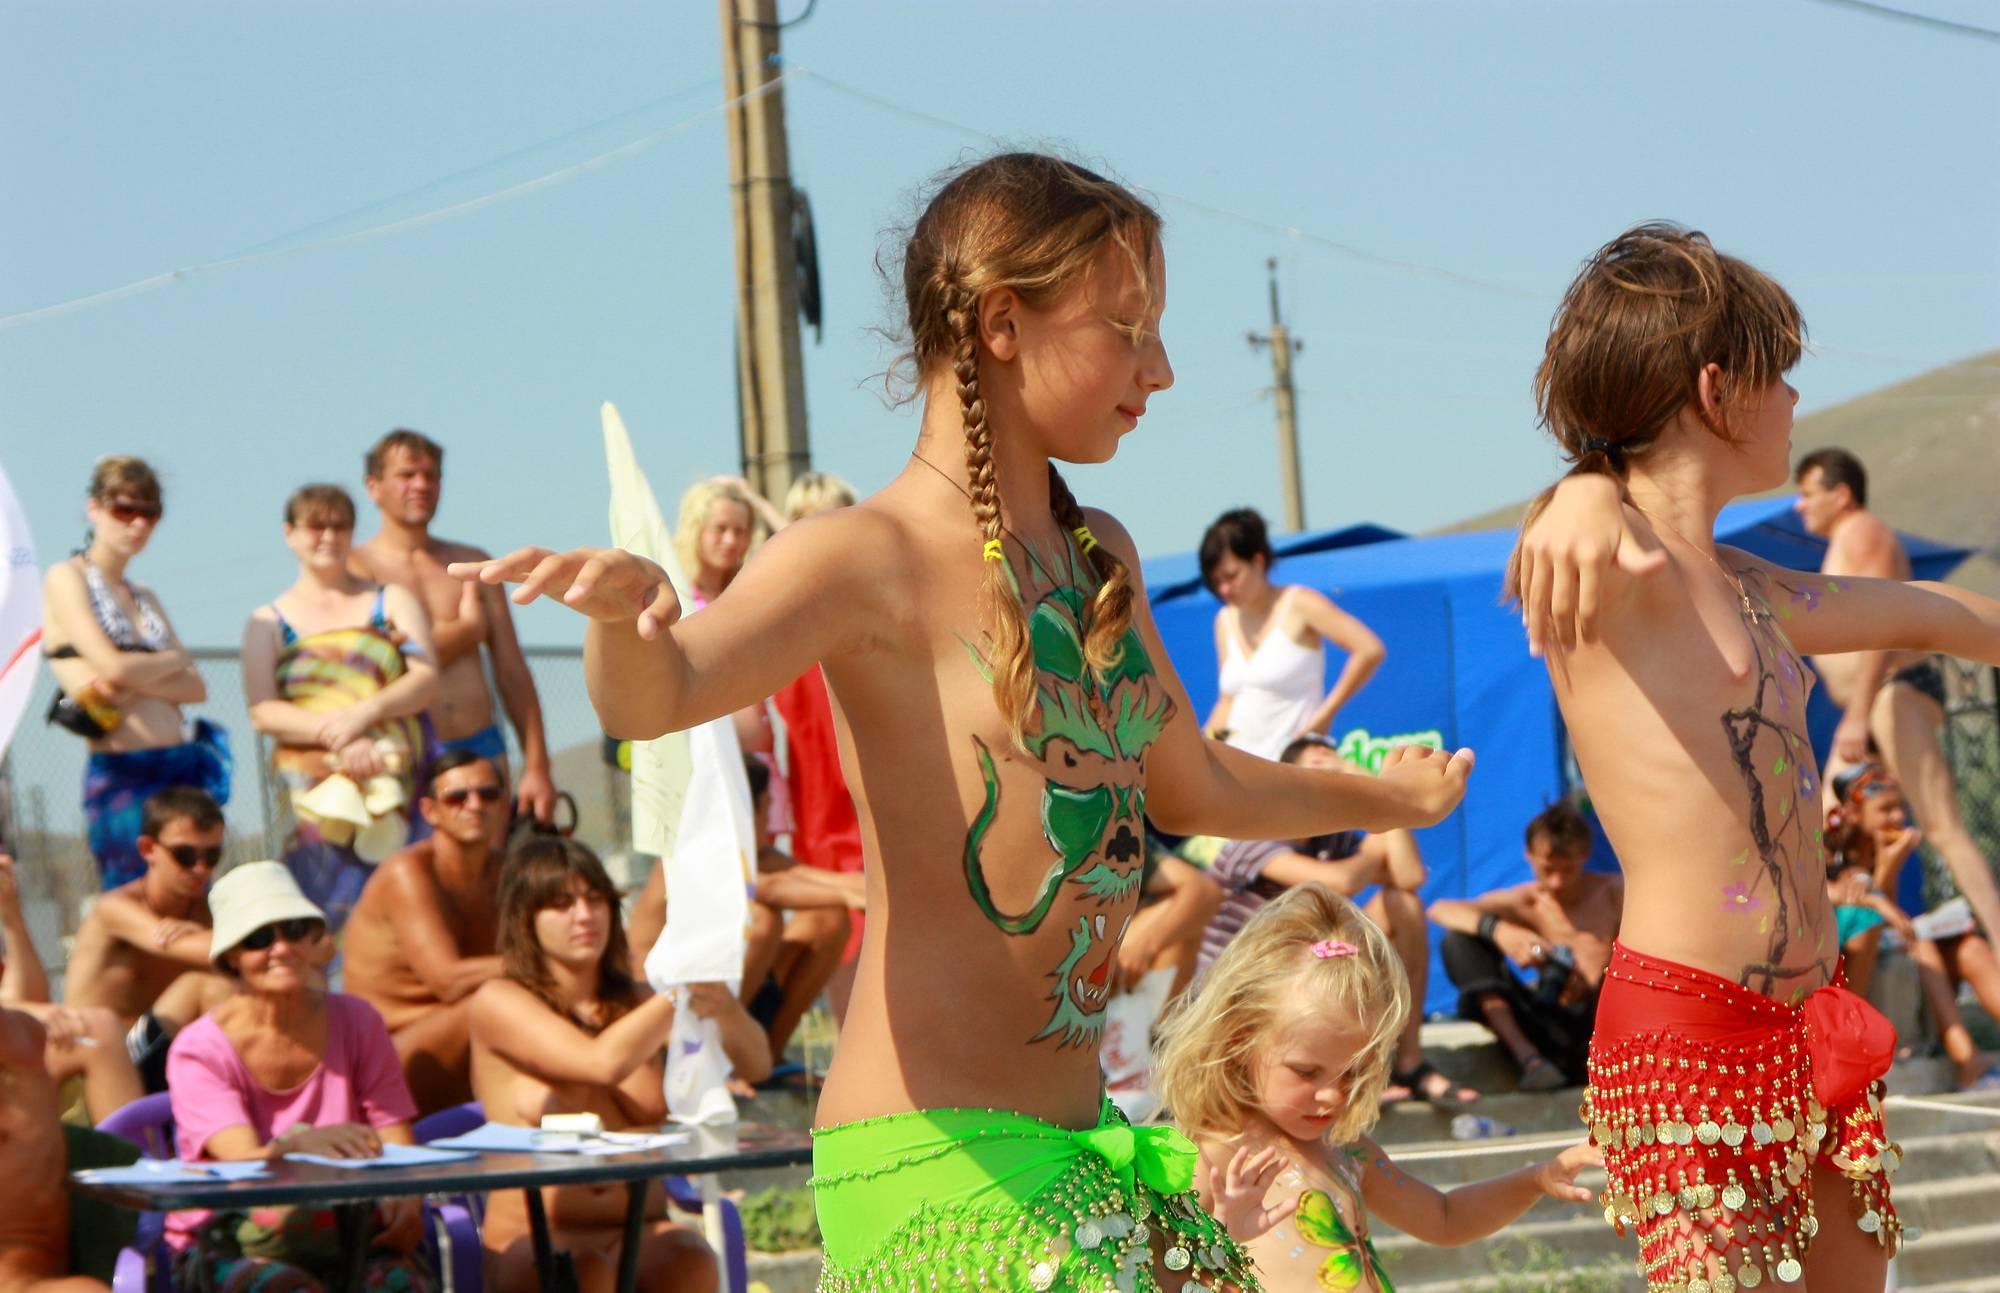 Purenudism Gallery-Miss Natura Group Dance - 1